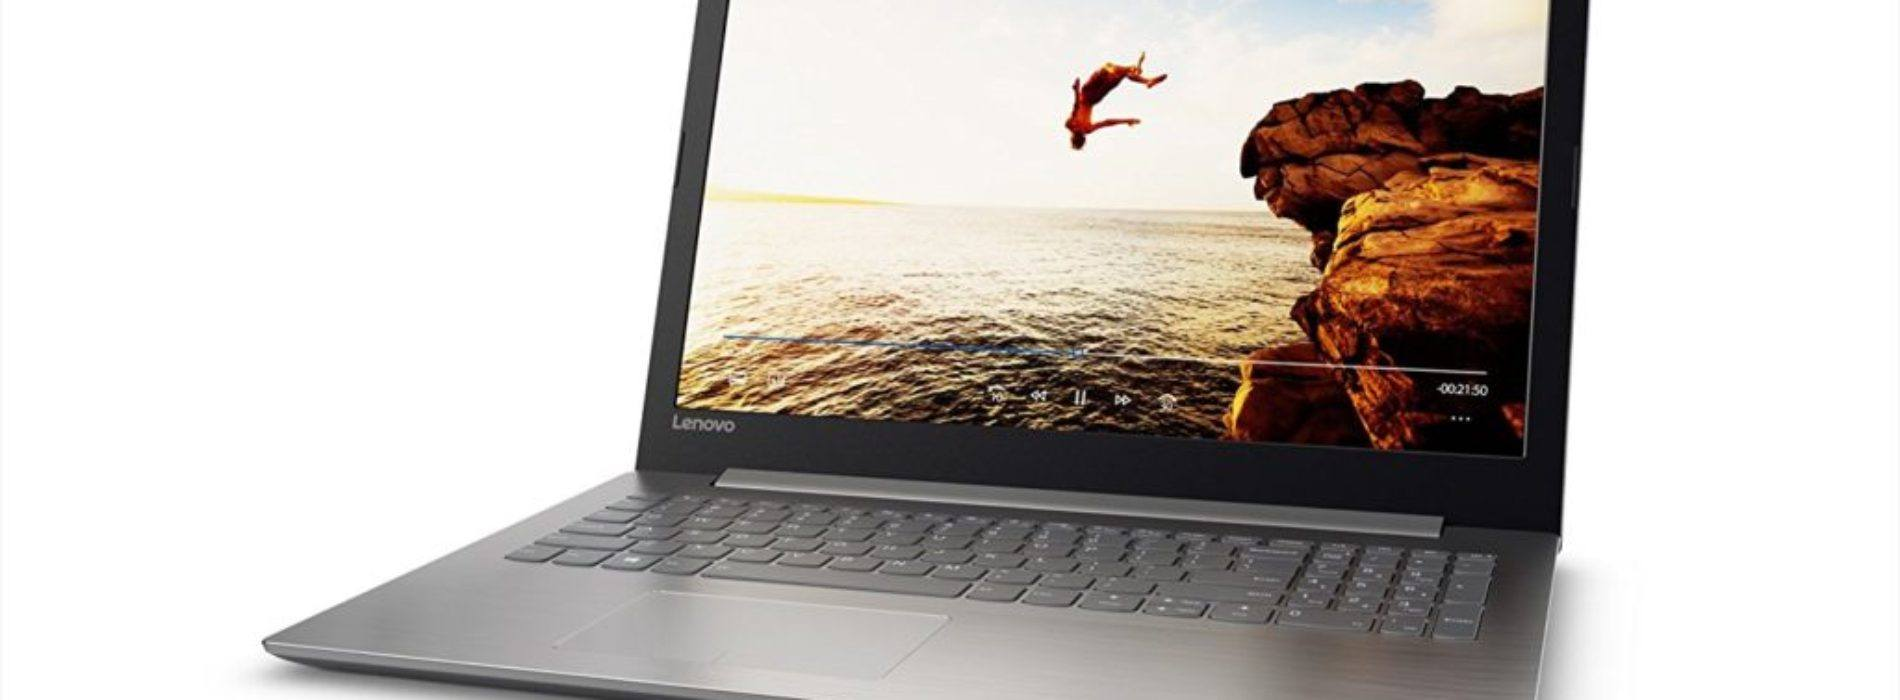 Lenovo Ideapad 320, nadie ofrece tanto por tan poco